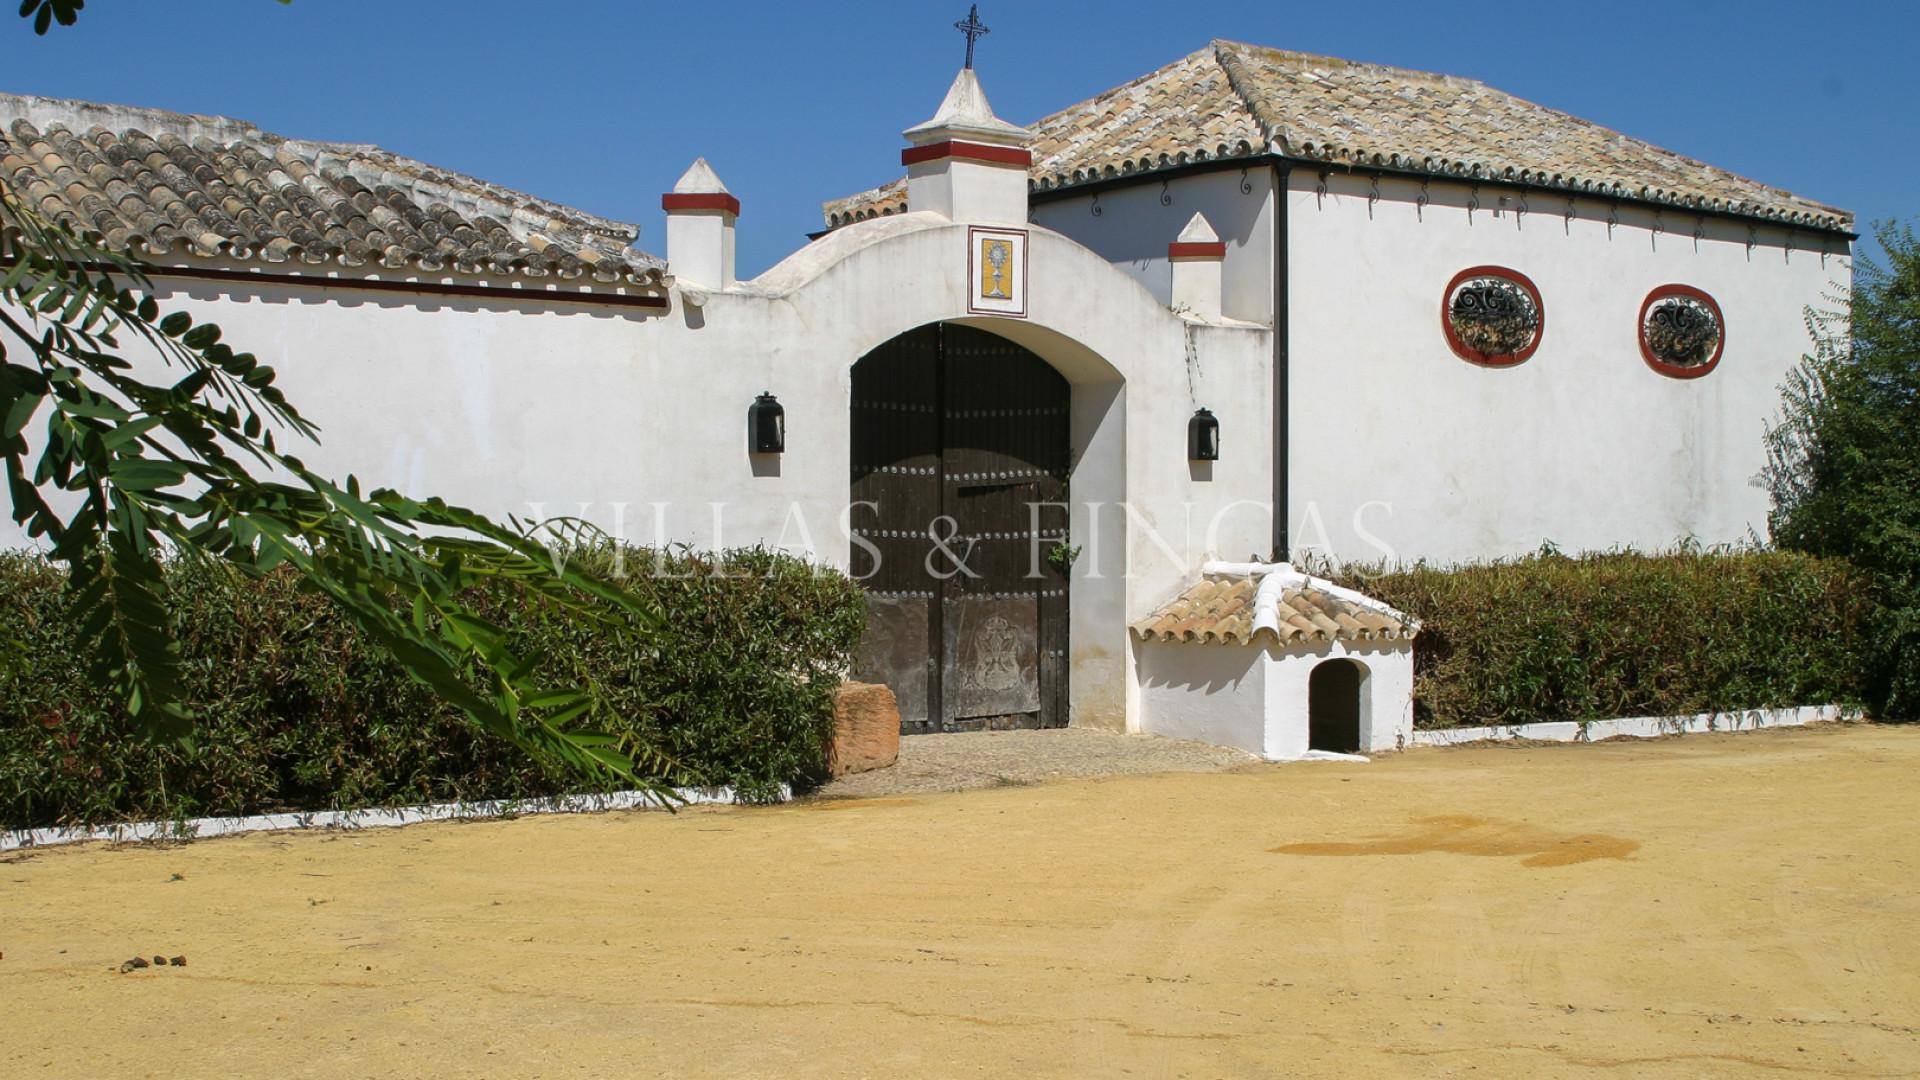 Cortijo con encanto sevilla - Cortijos andaluces encanto ...